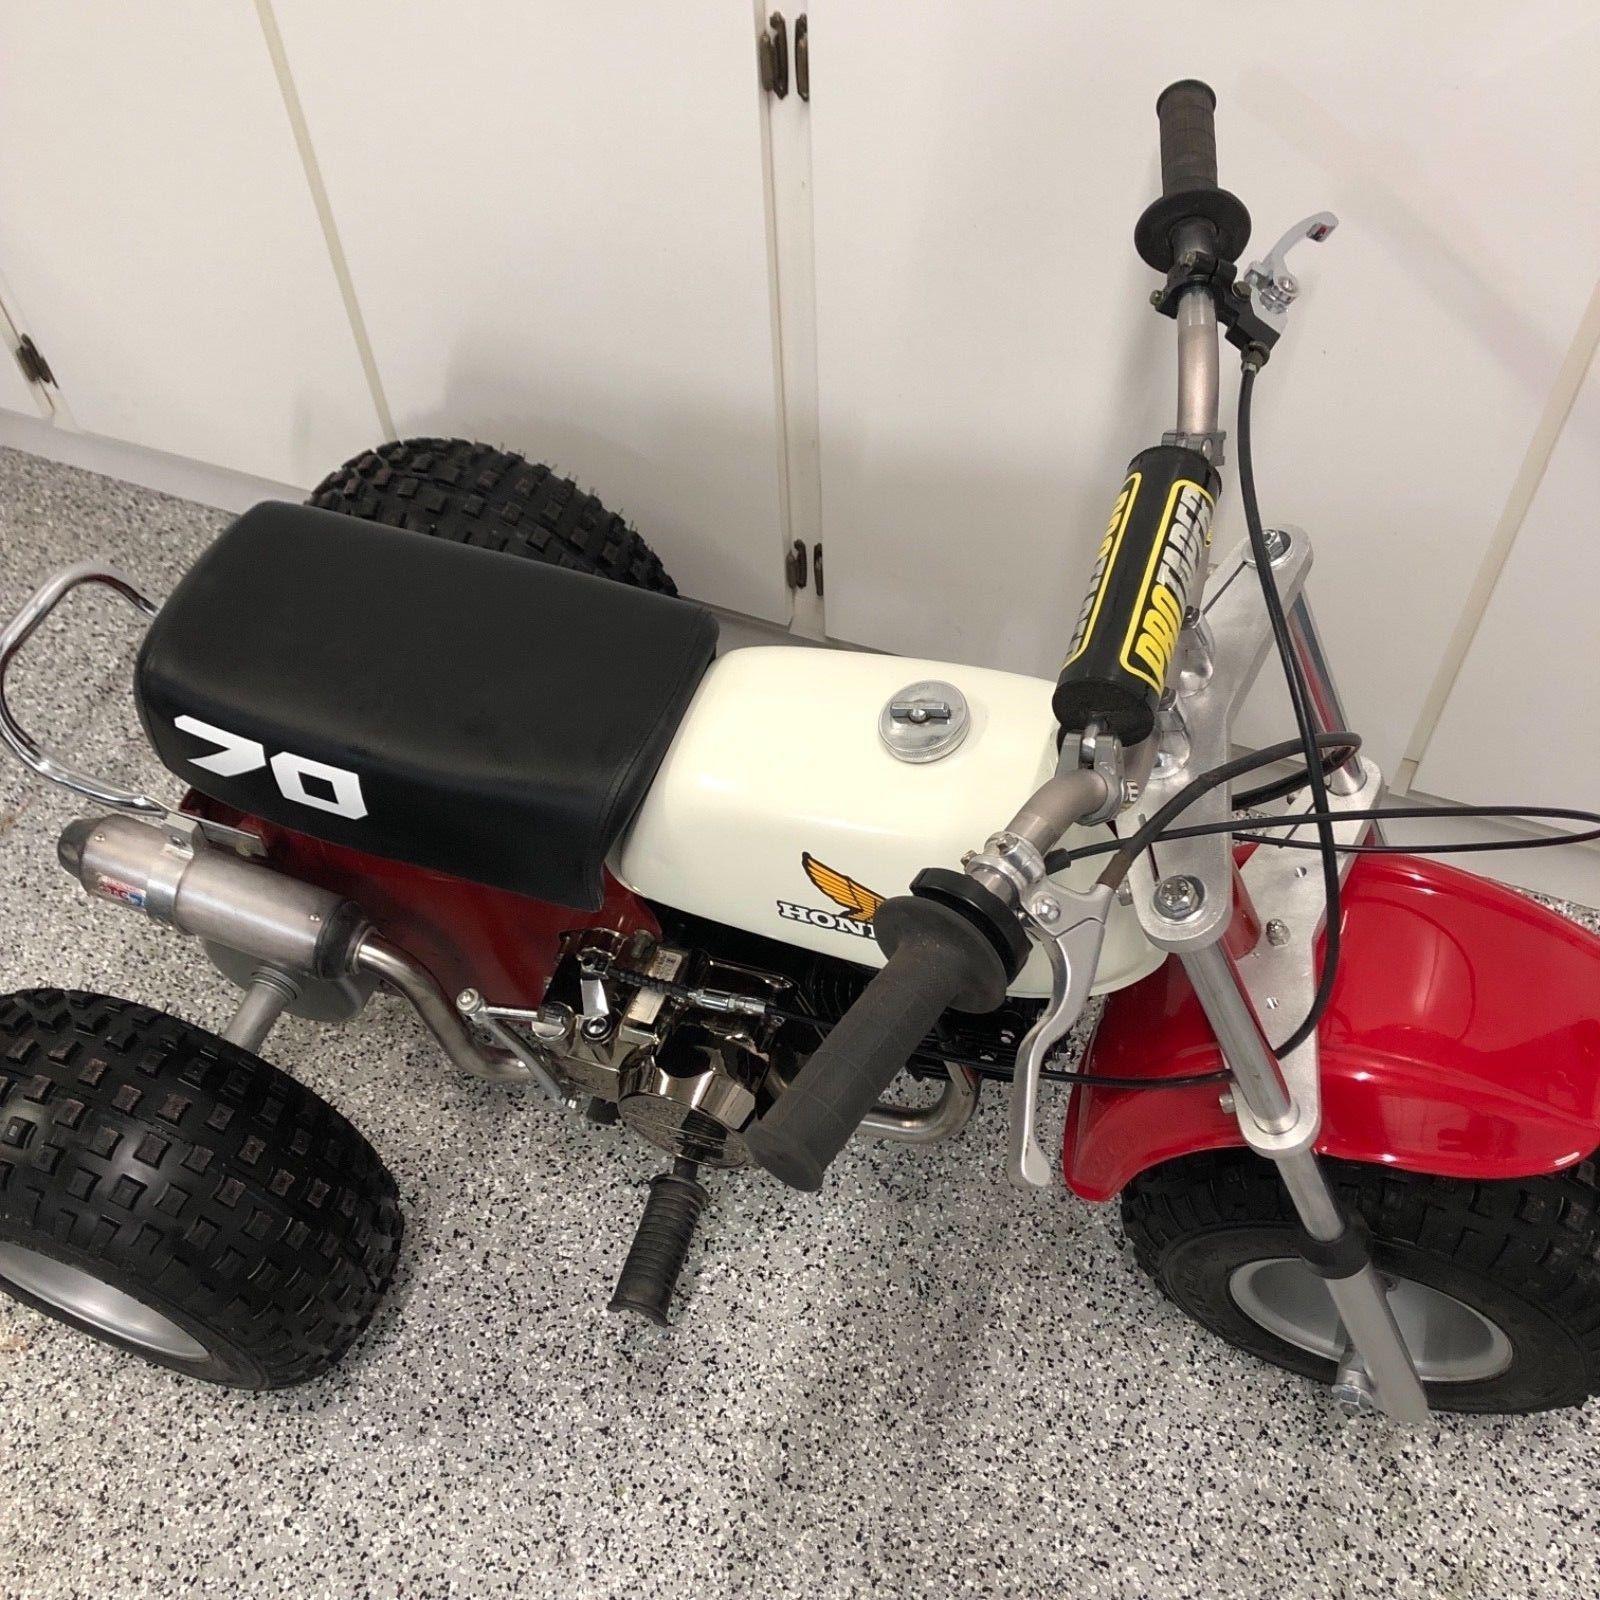 Honda ATC 70 ATV Three Wheeler Trike 140 Lifan Motor Front